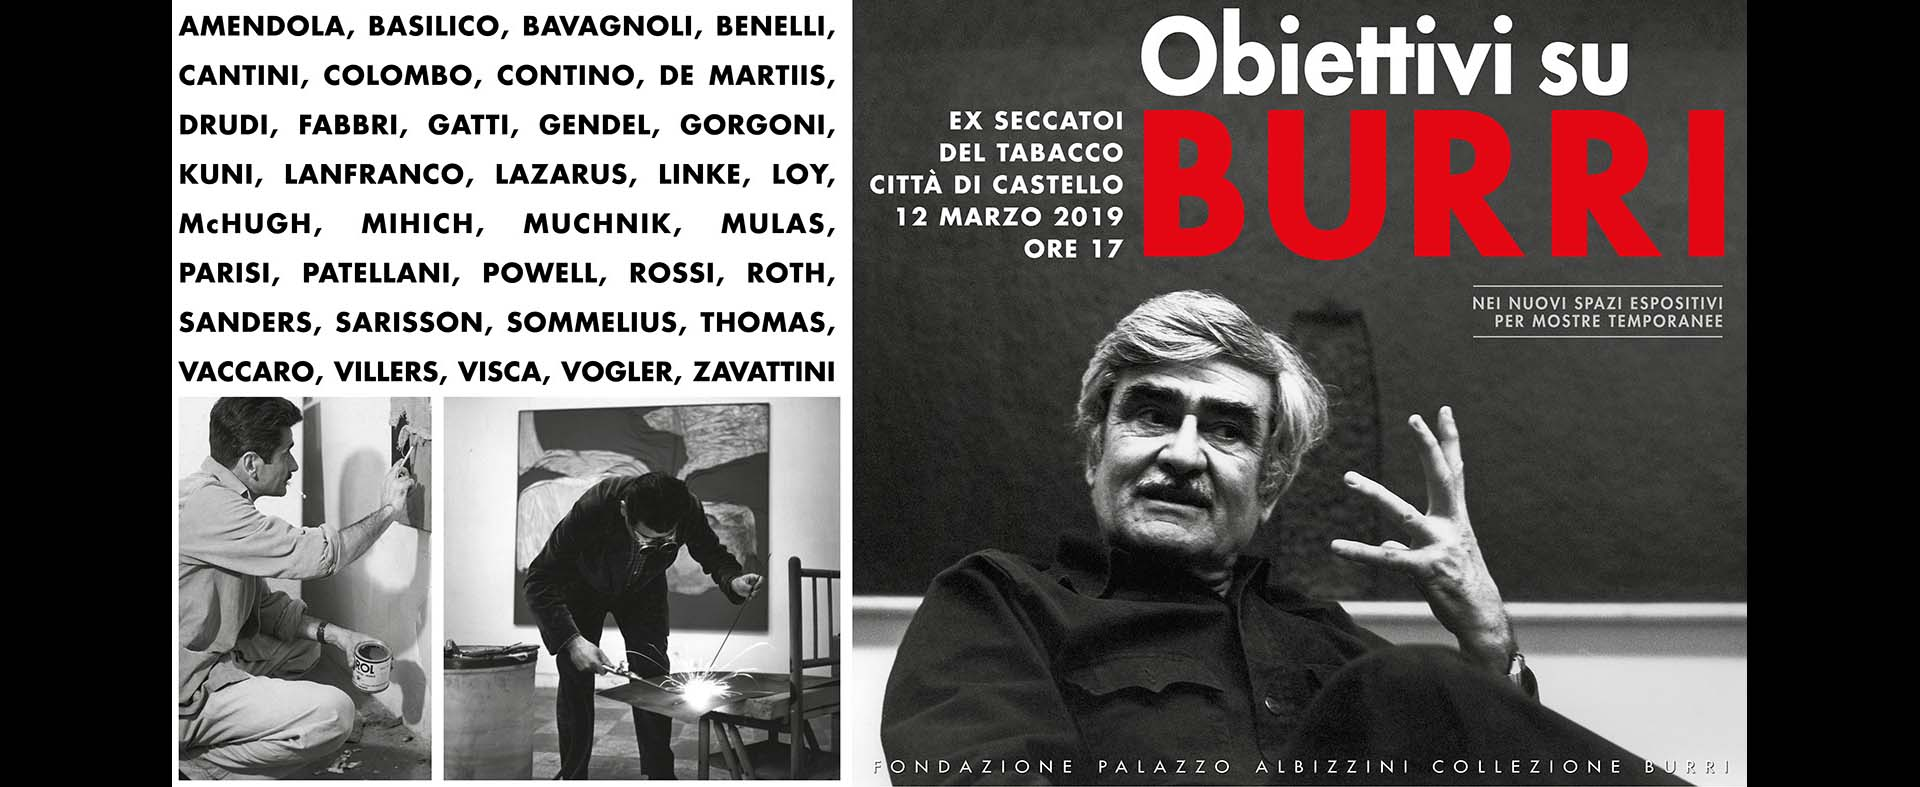 obiettivi-su-burri-2019-slide1